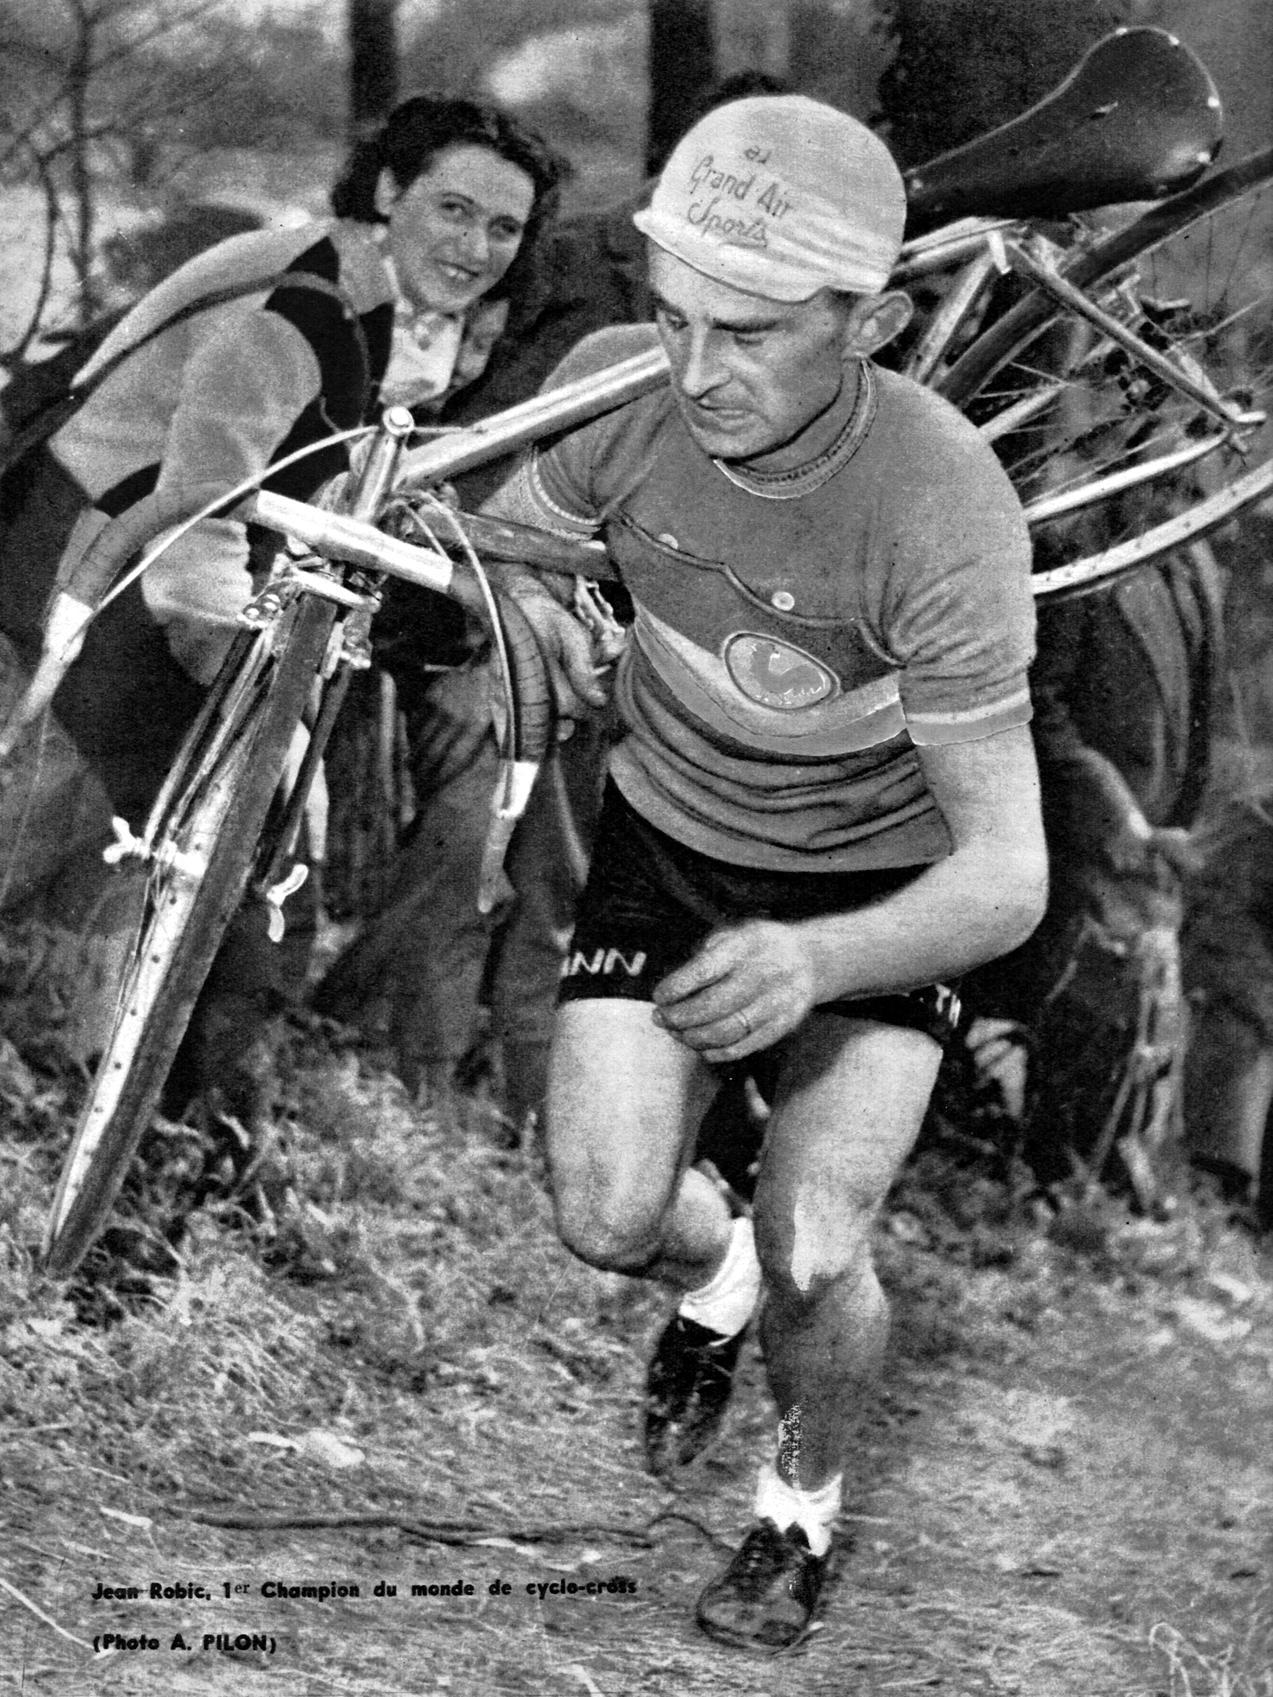 Jean Robic 1950.jpg